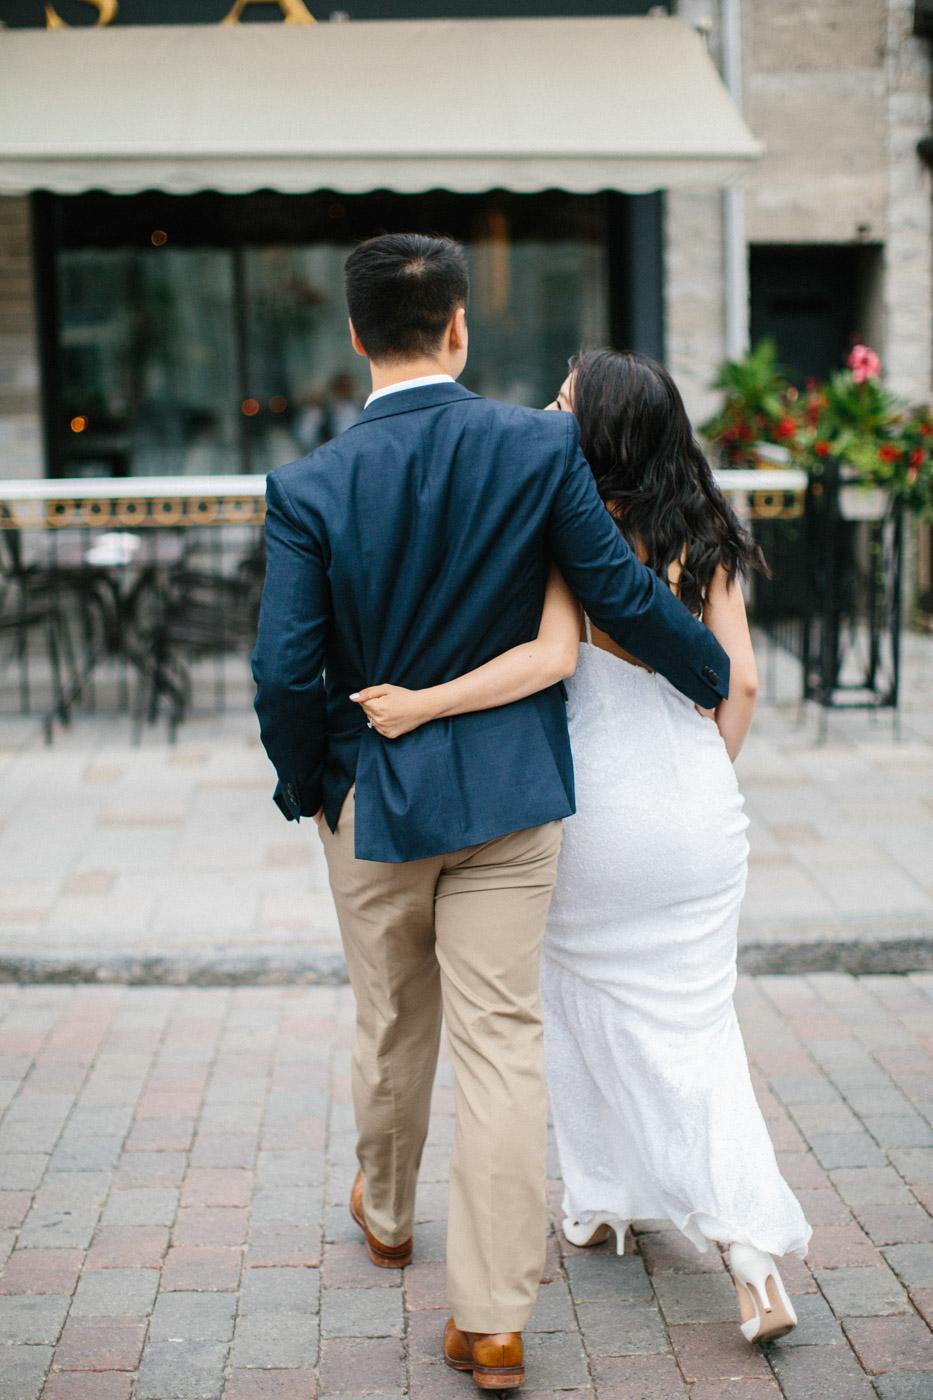 toronto_wedding_photographer_engagement_photography_tips-44.jpg